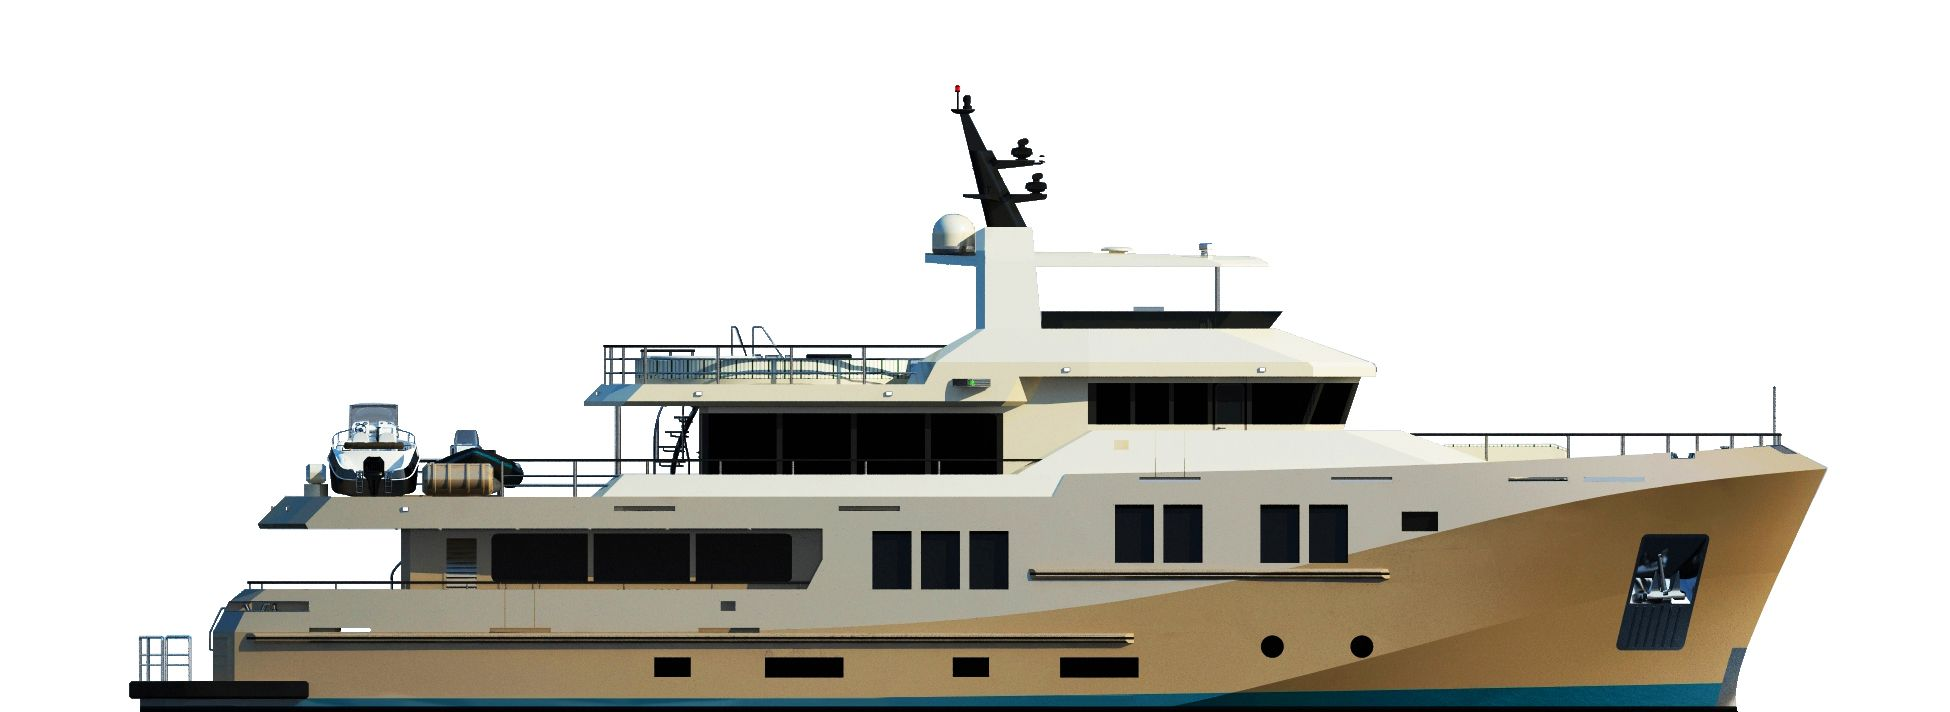 Bering 80 oceanic yacht luxury yacht bering yachts for Garden design trawler boat